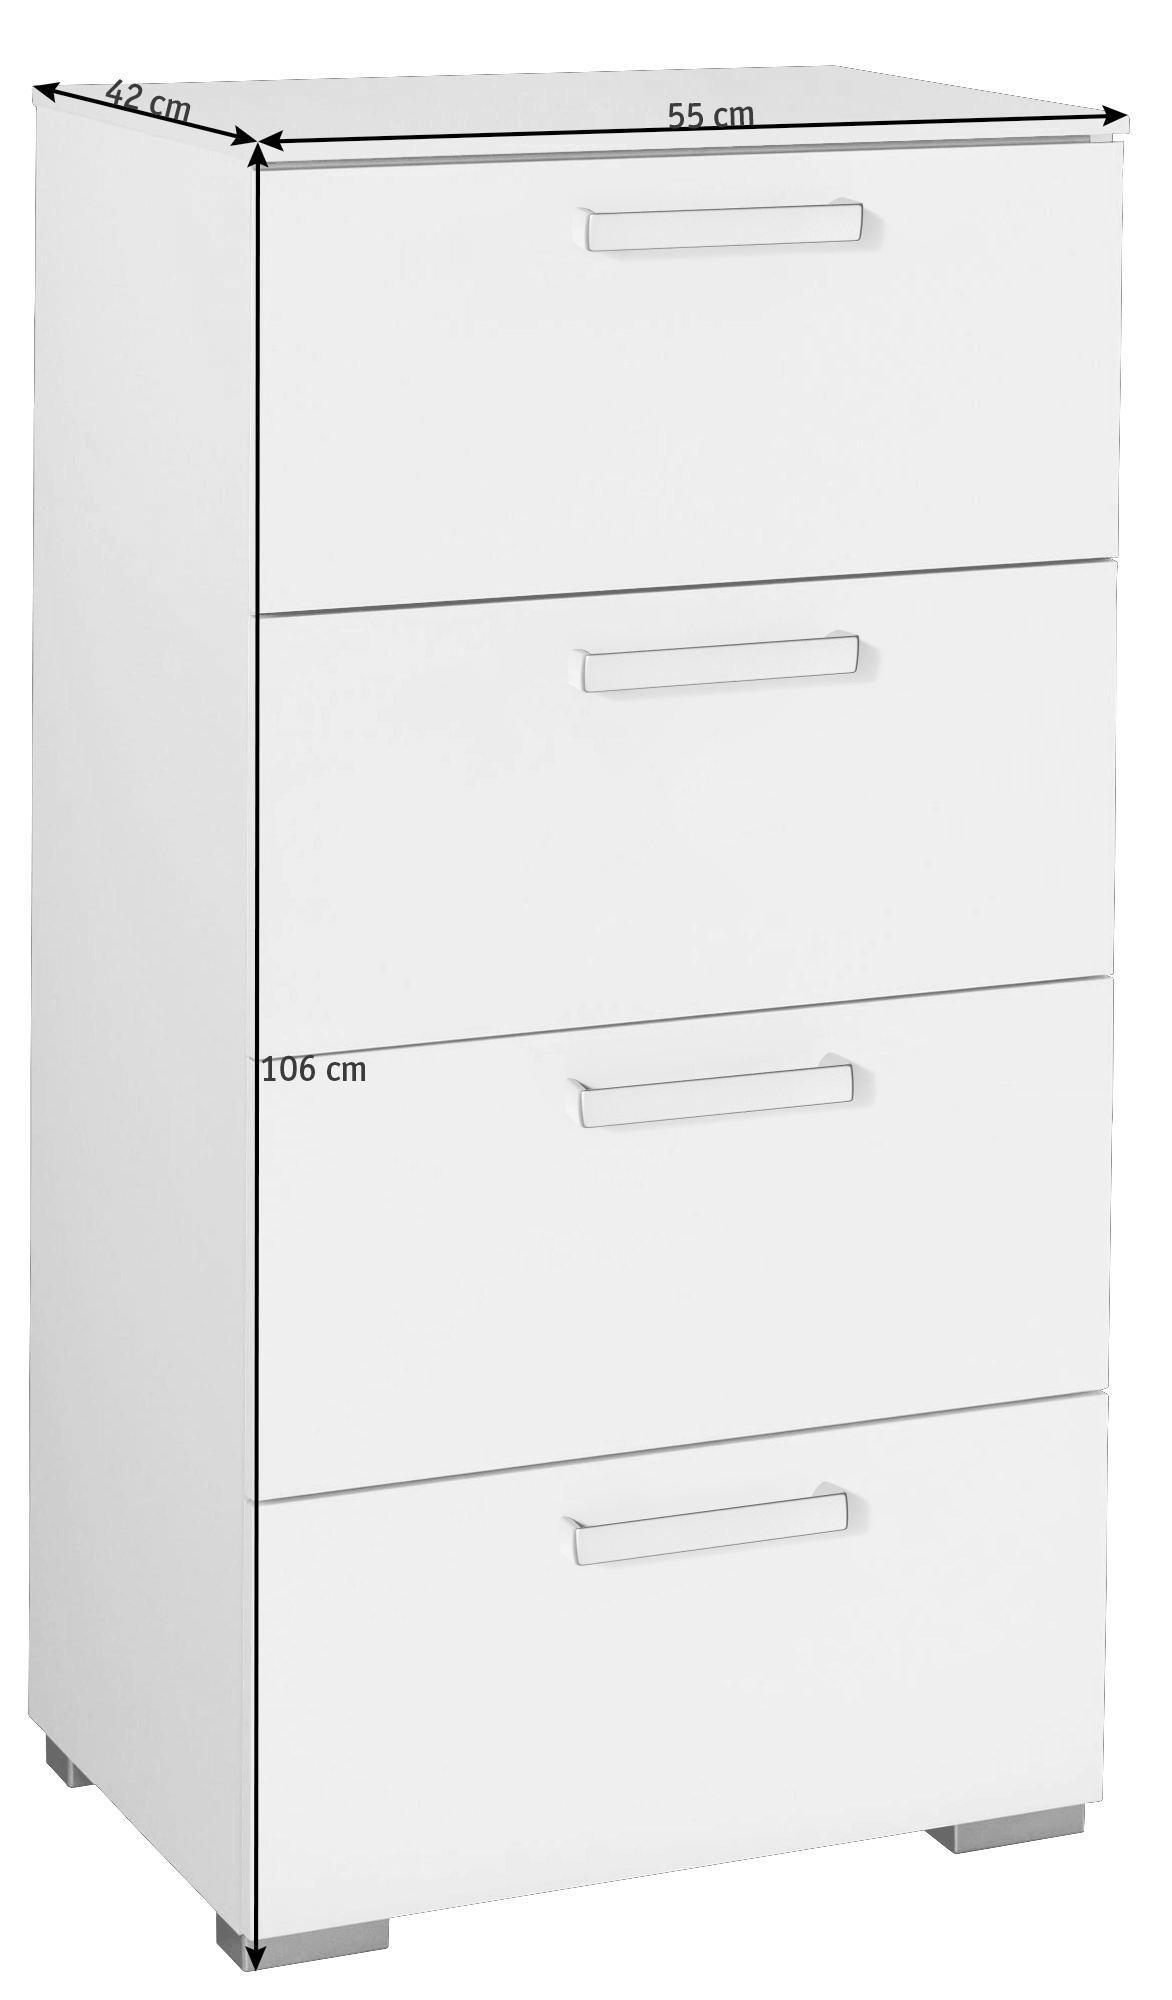 KOMMODE Weiß - Silberfarben/Alufarben, Design, Kunststoff/Metall (55/106/42cm) - HOM`IN